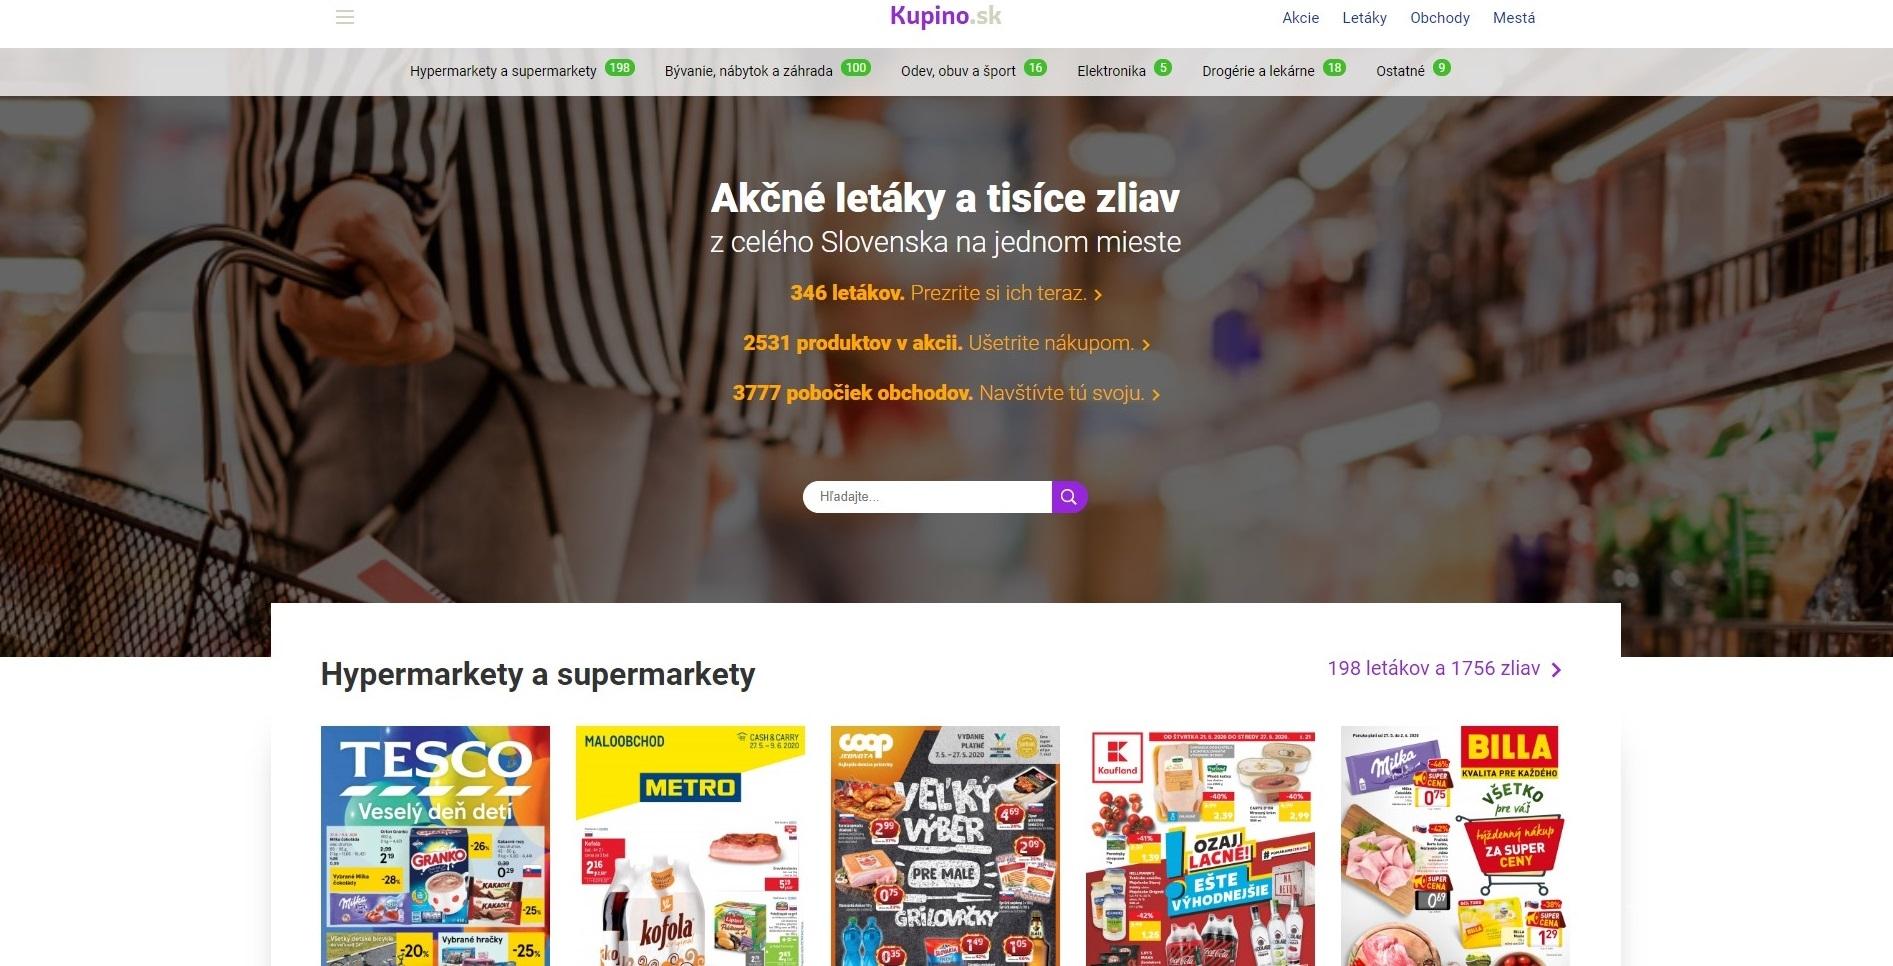 Web Kupino.sk